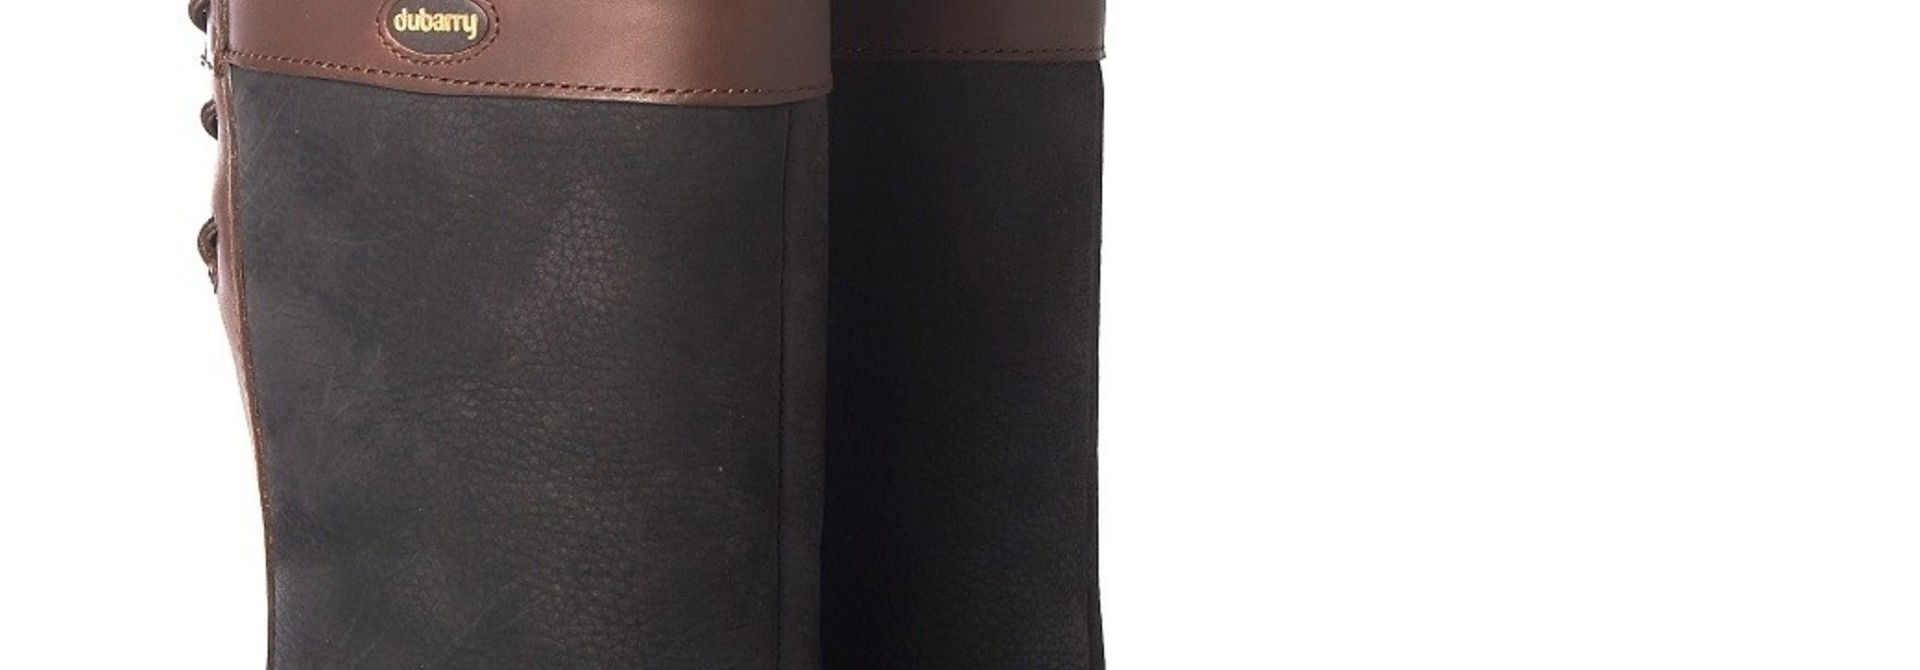 Dubarry Glanmire - Black/Brown